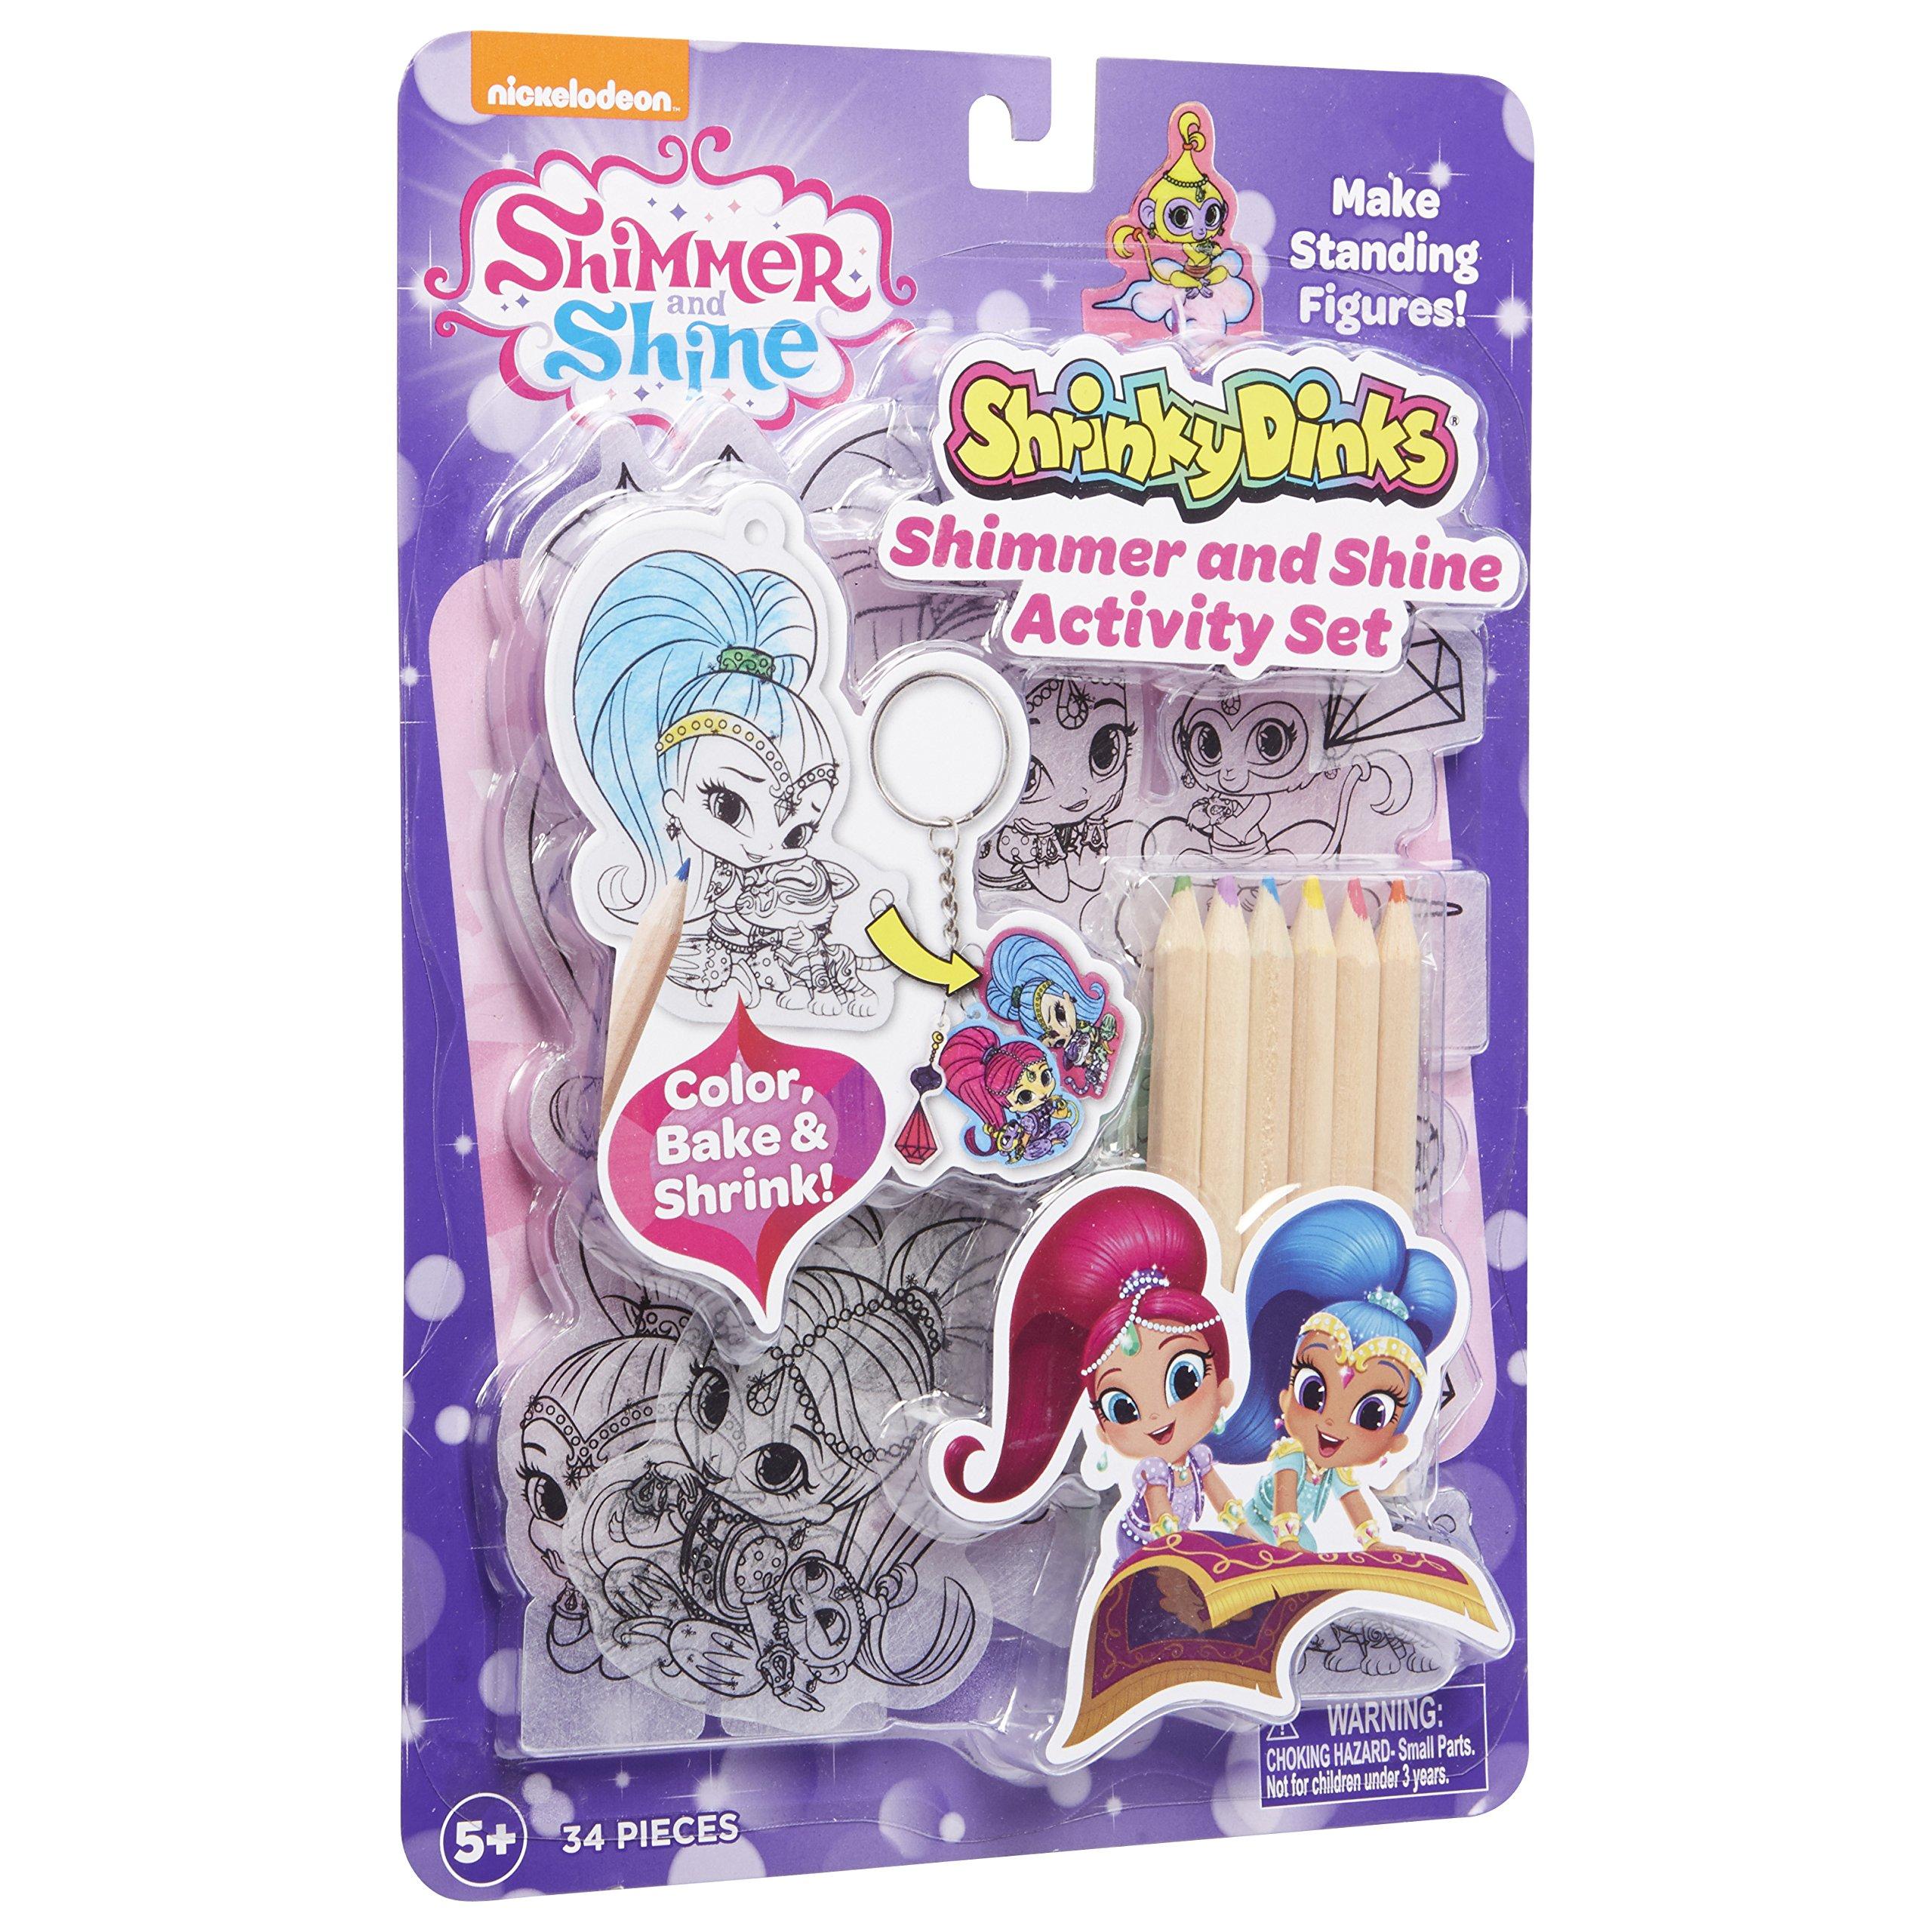 Shimmer and Shine Shrinky Dinks Activity Set